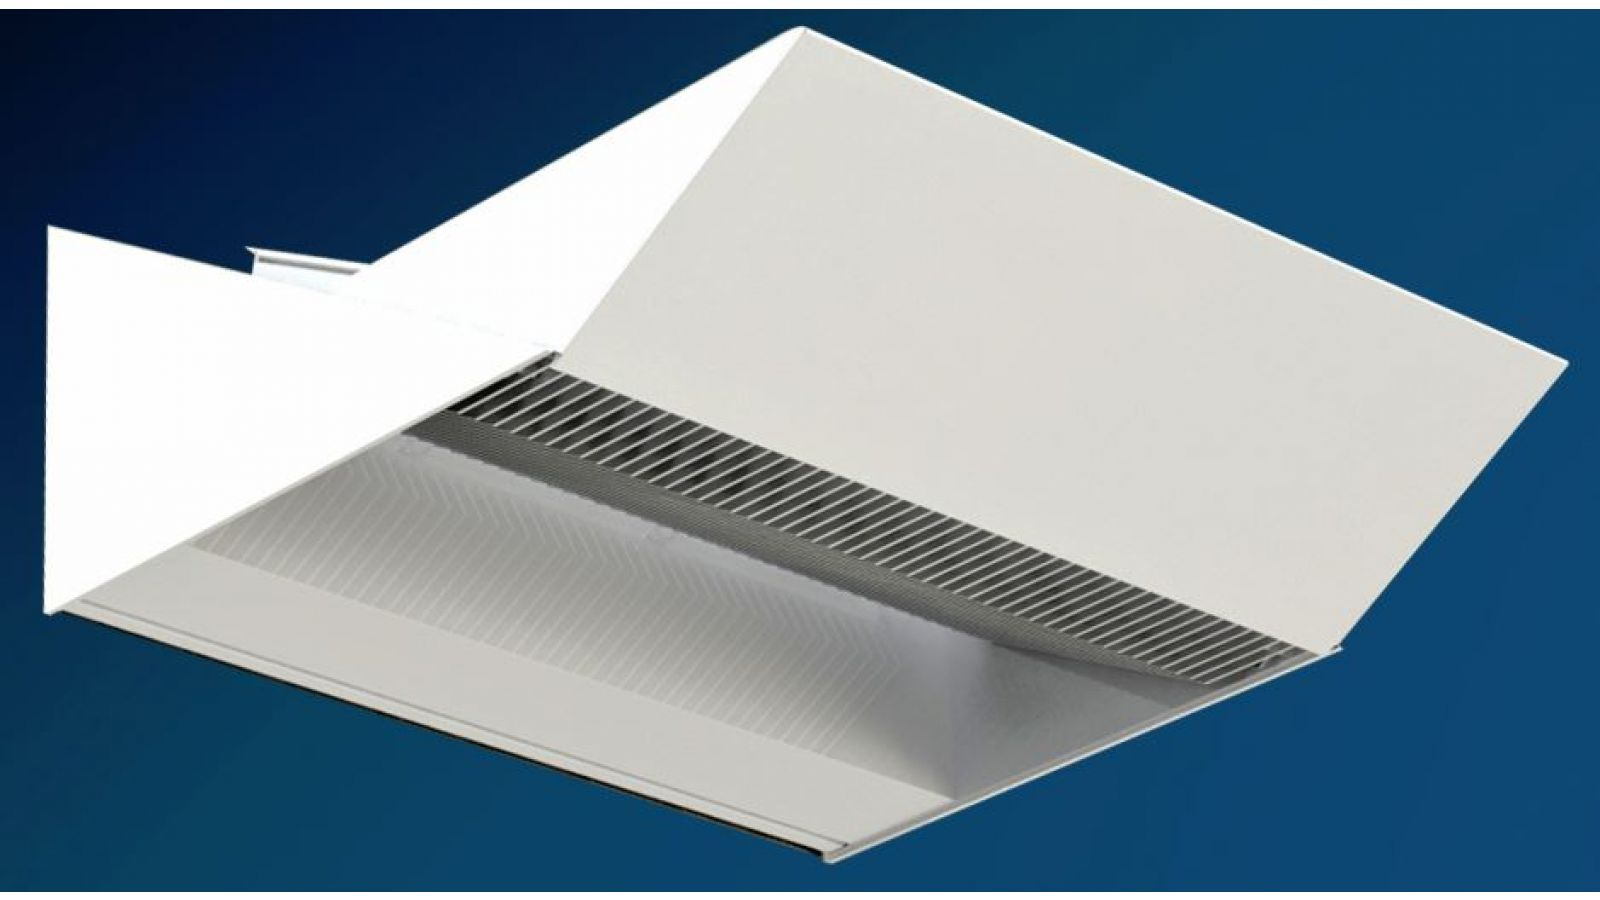 S43x LED Asymmetric Uplight by elliptipar